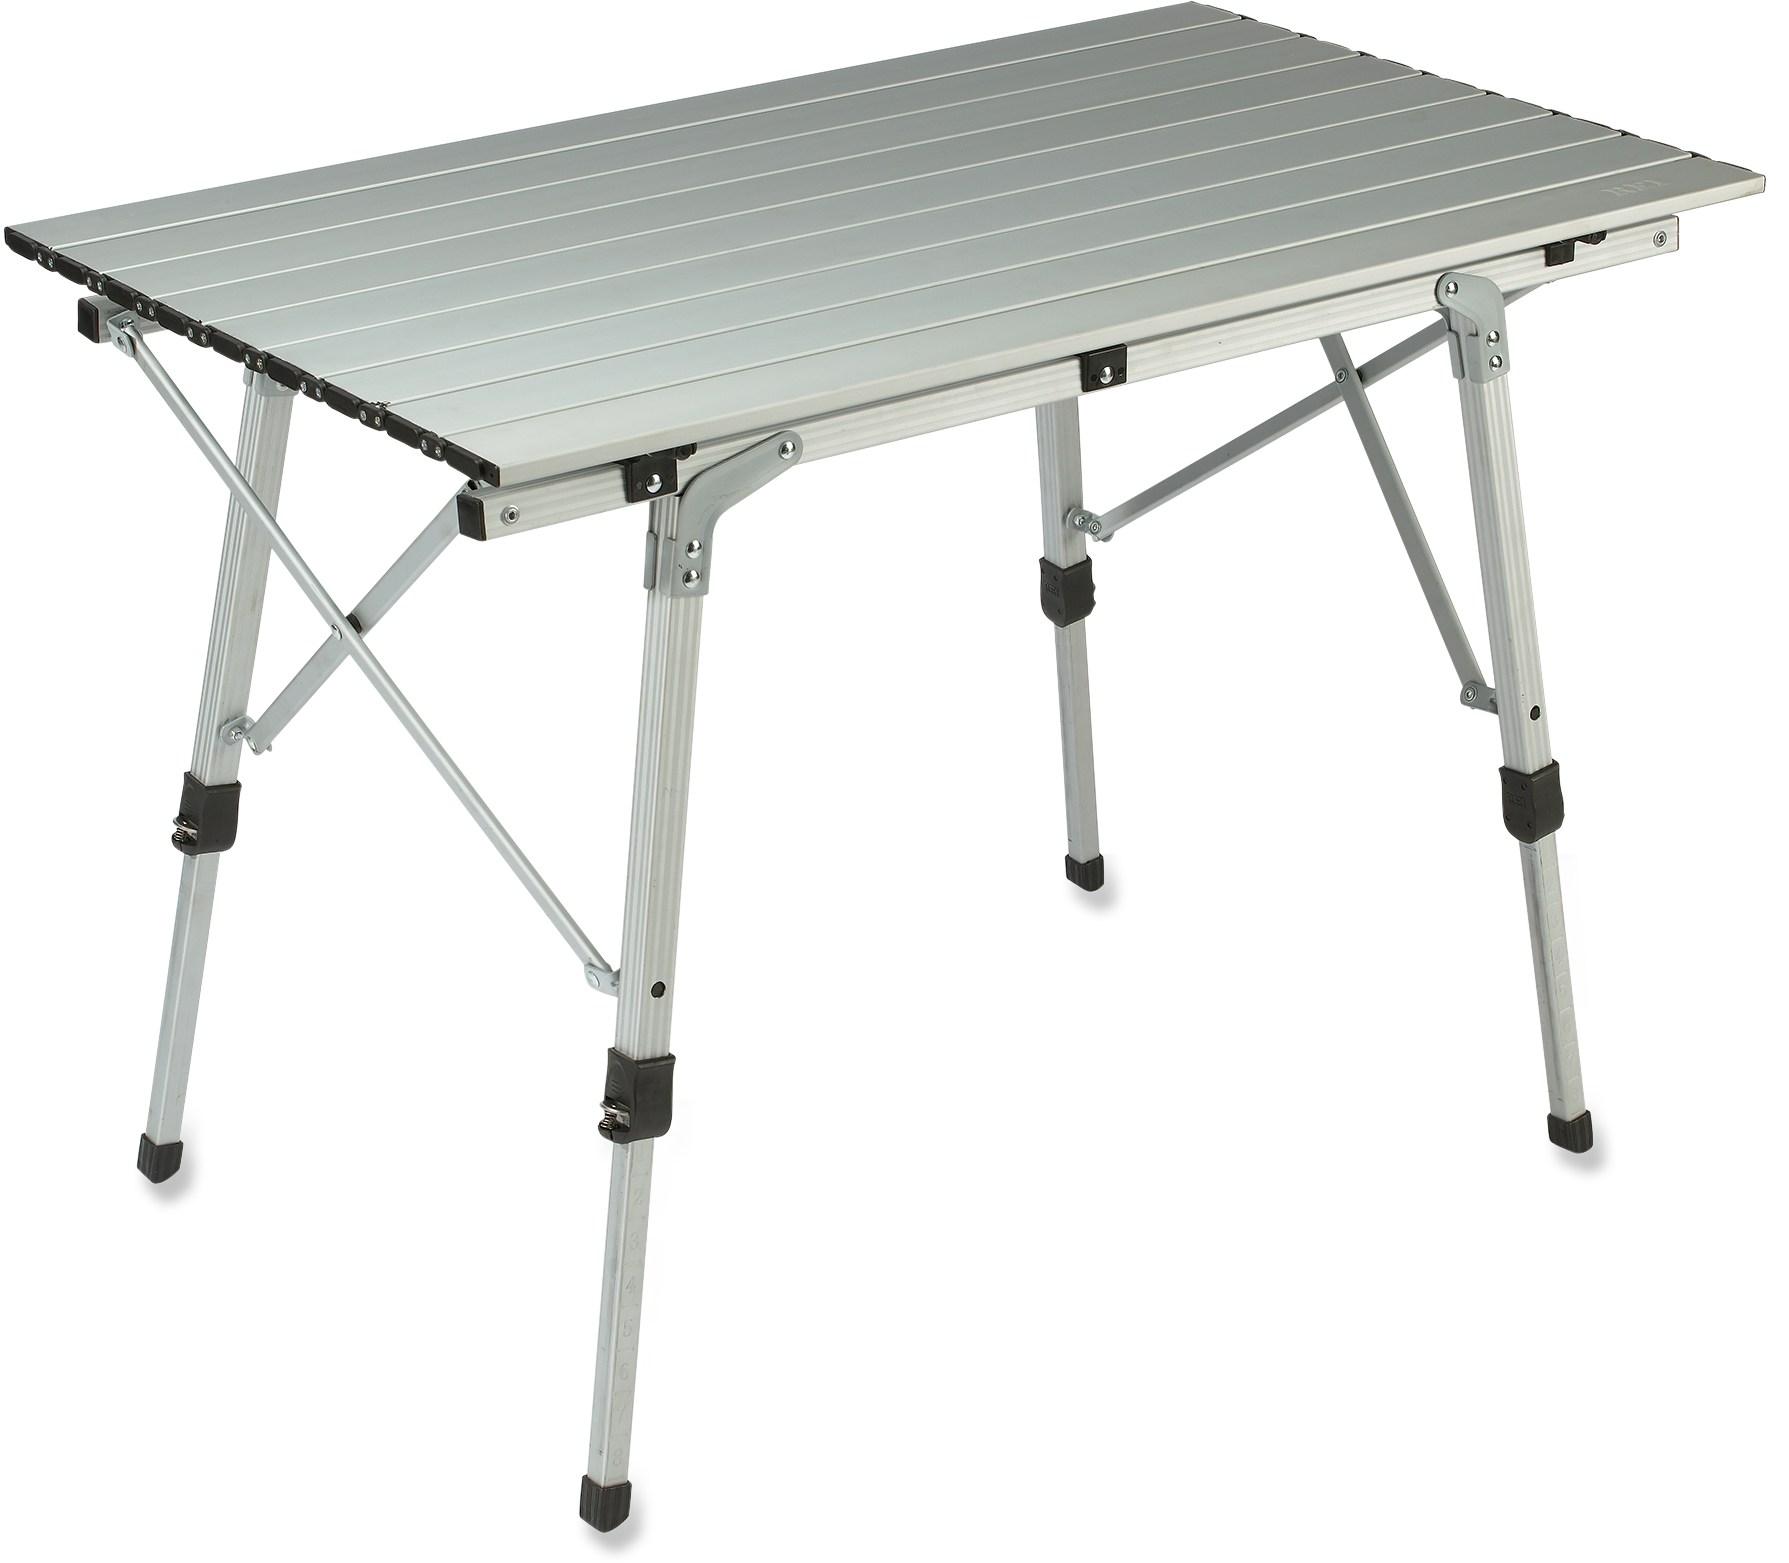 89812cb2 A236 429e Aa04 E97760cff9a4 REI Camp Table